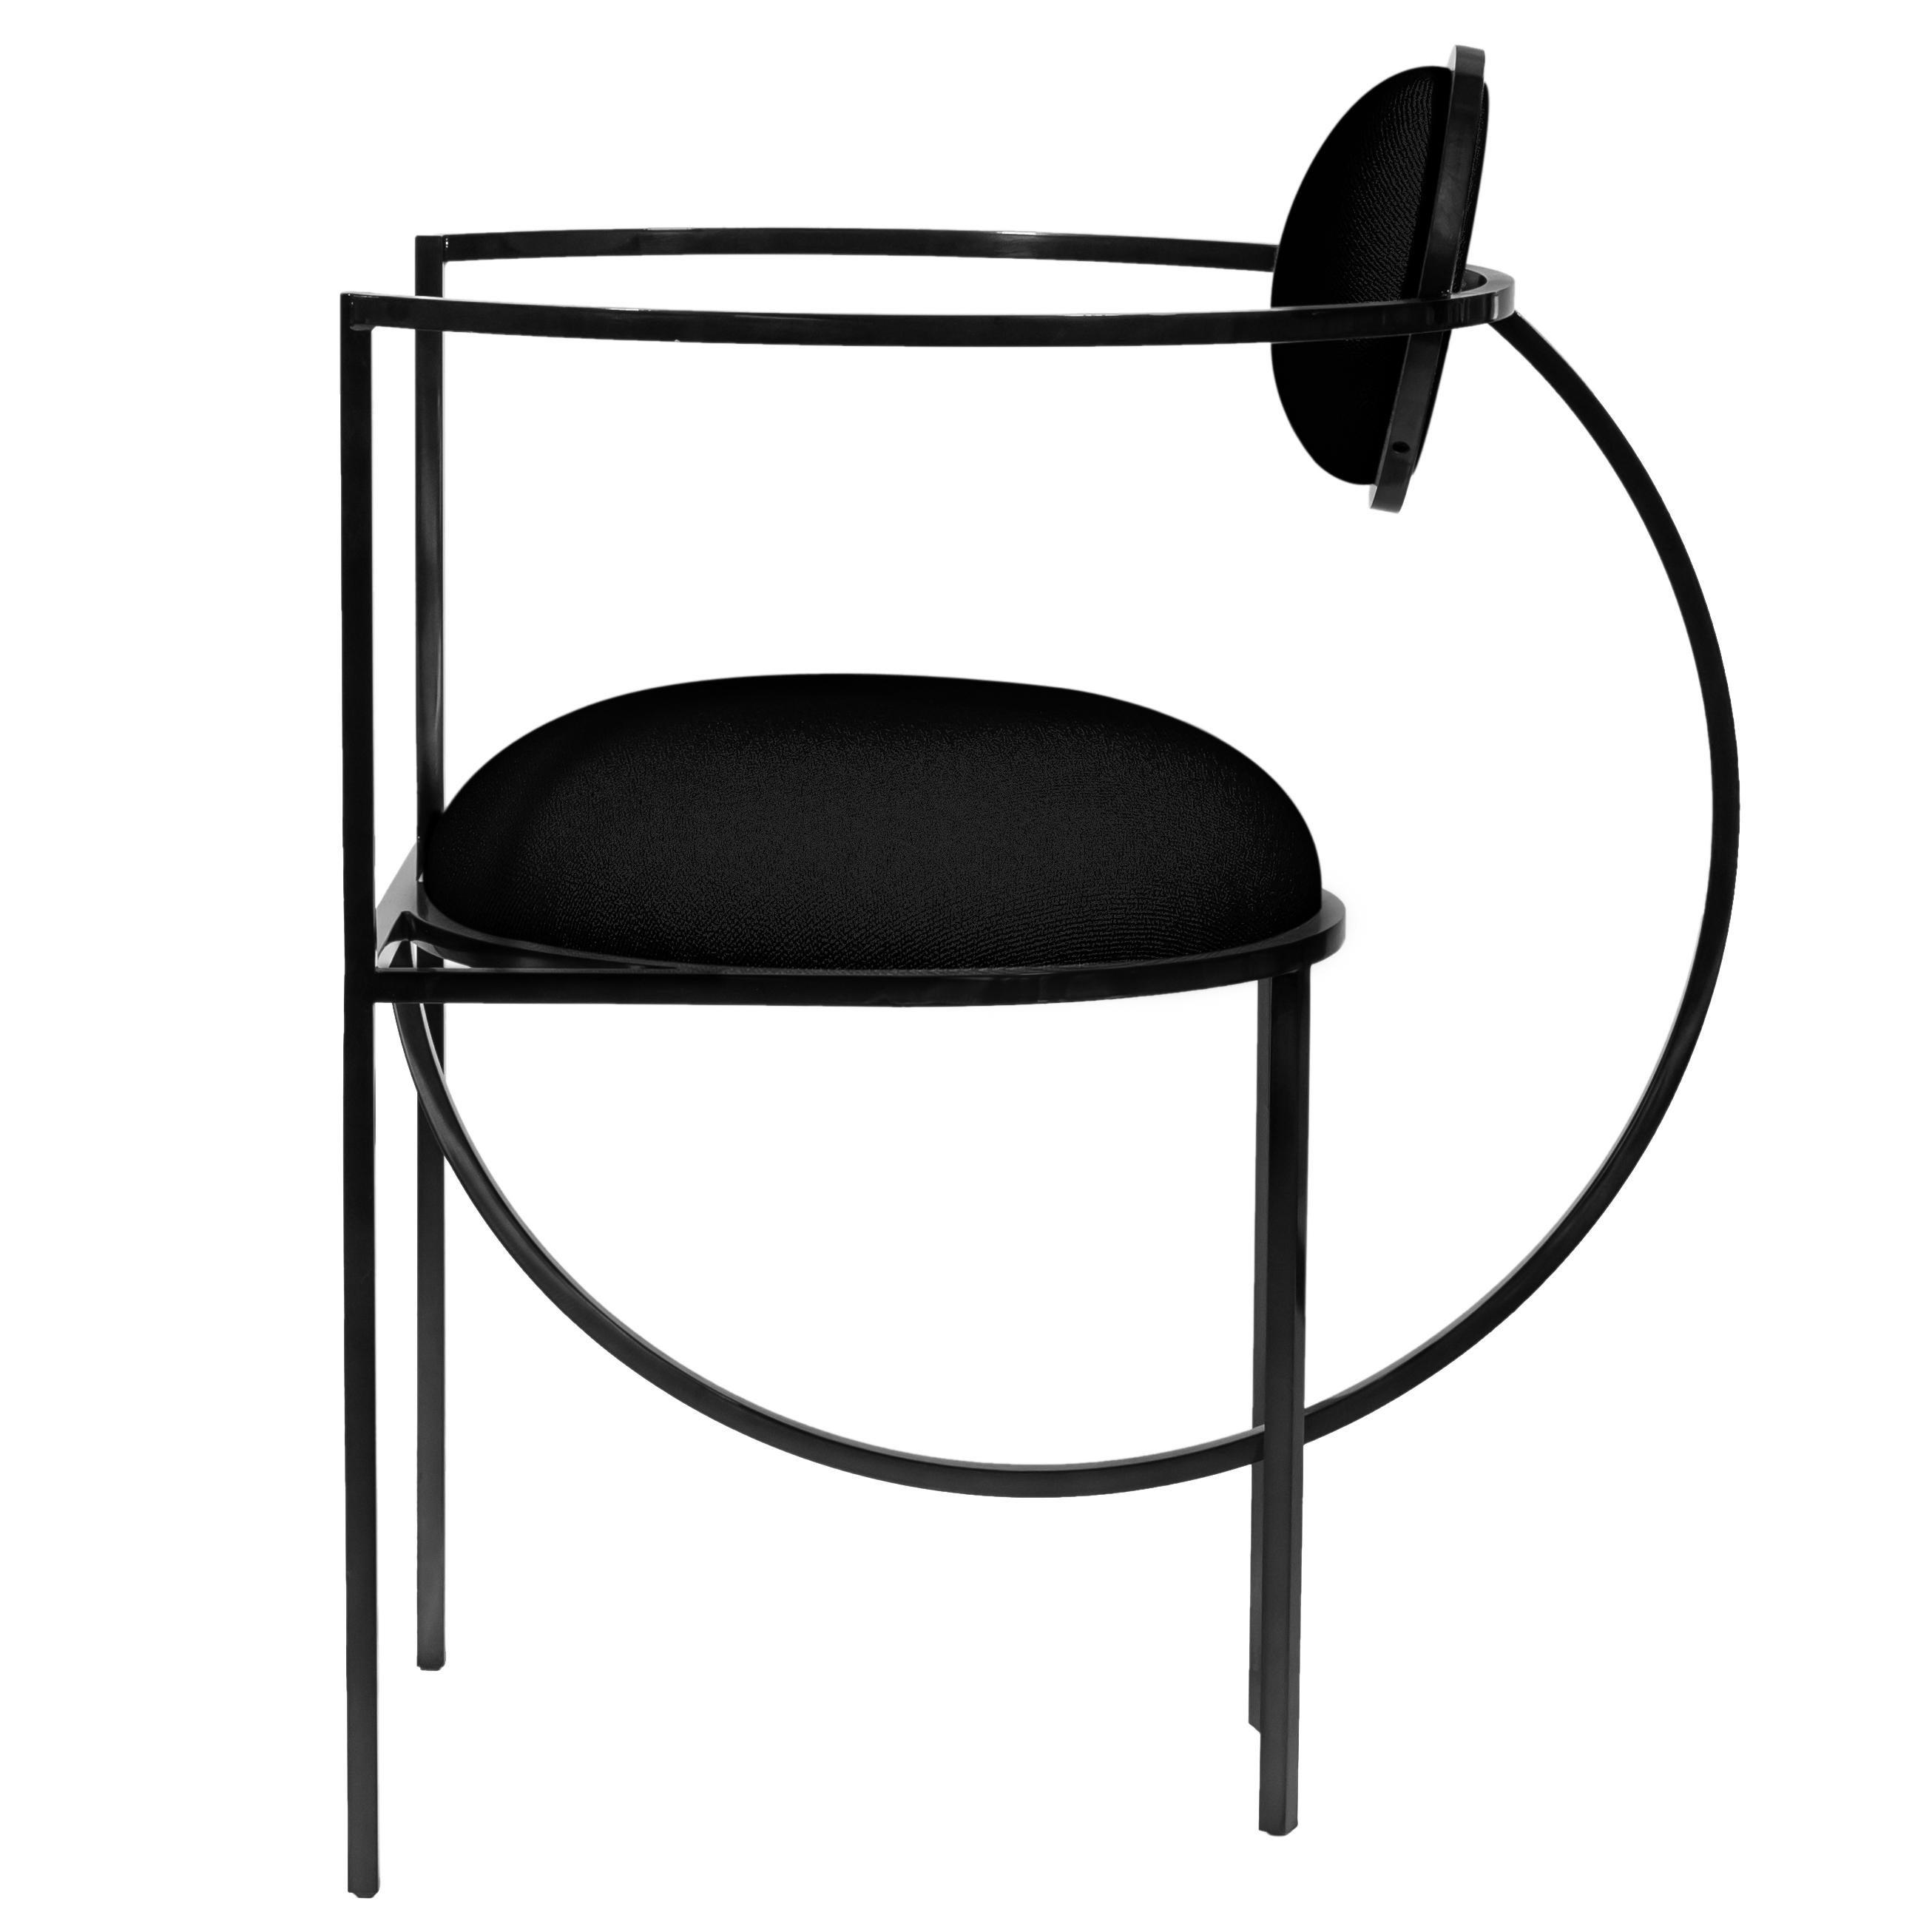 Lunar Chair in Black Fabric and Coated Steel, by Lara Bohinc